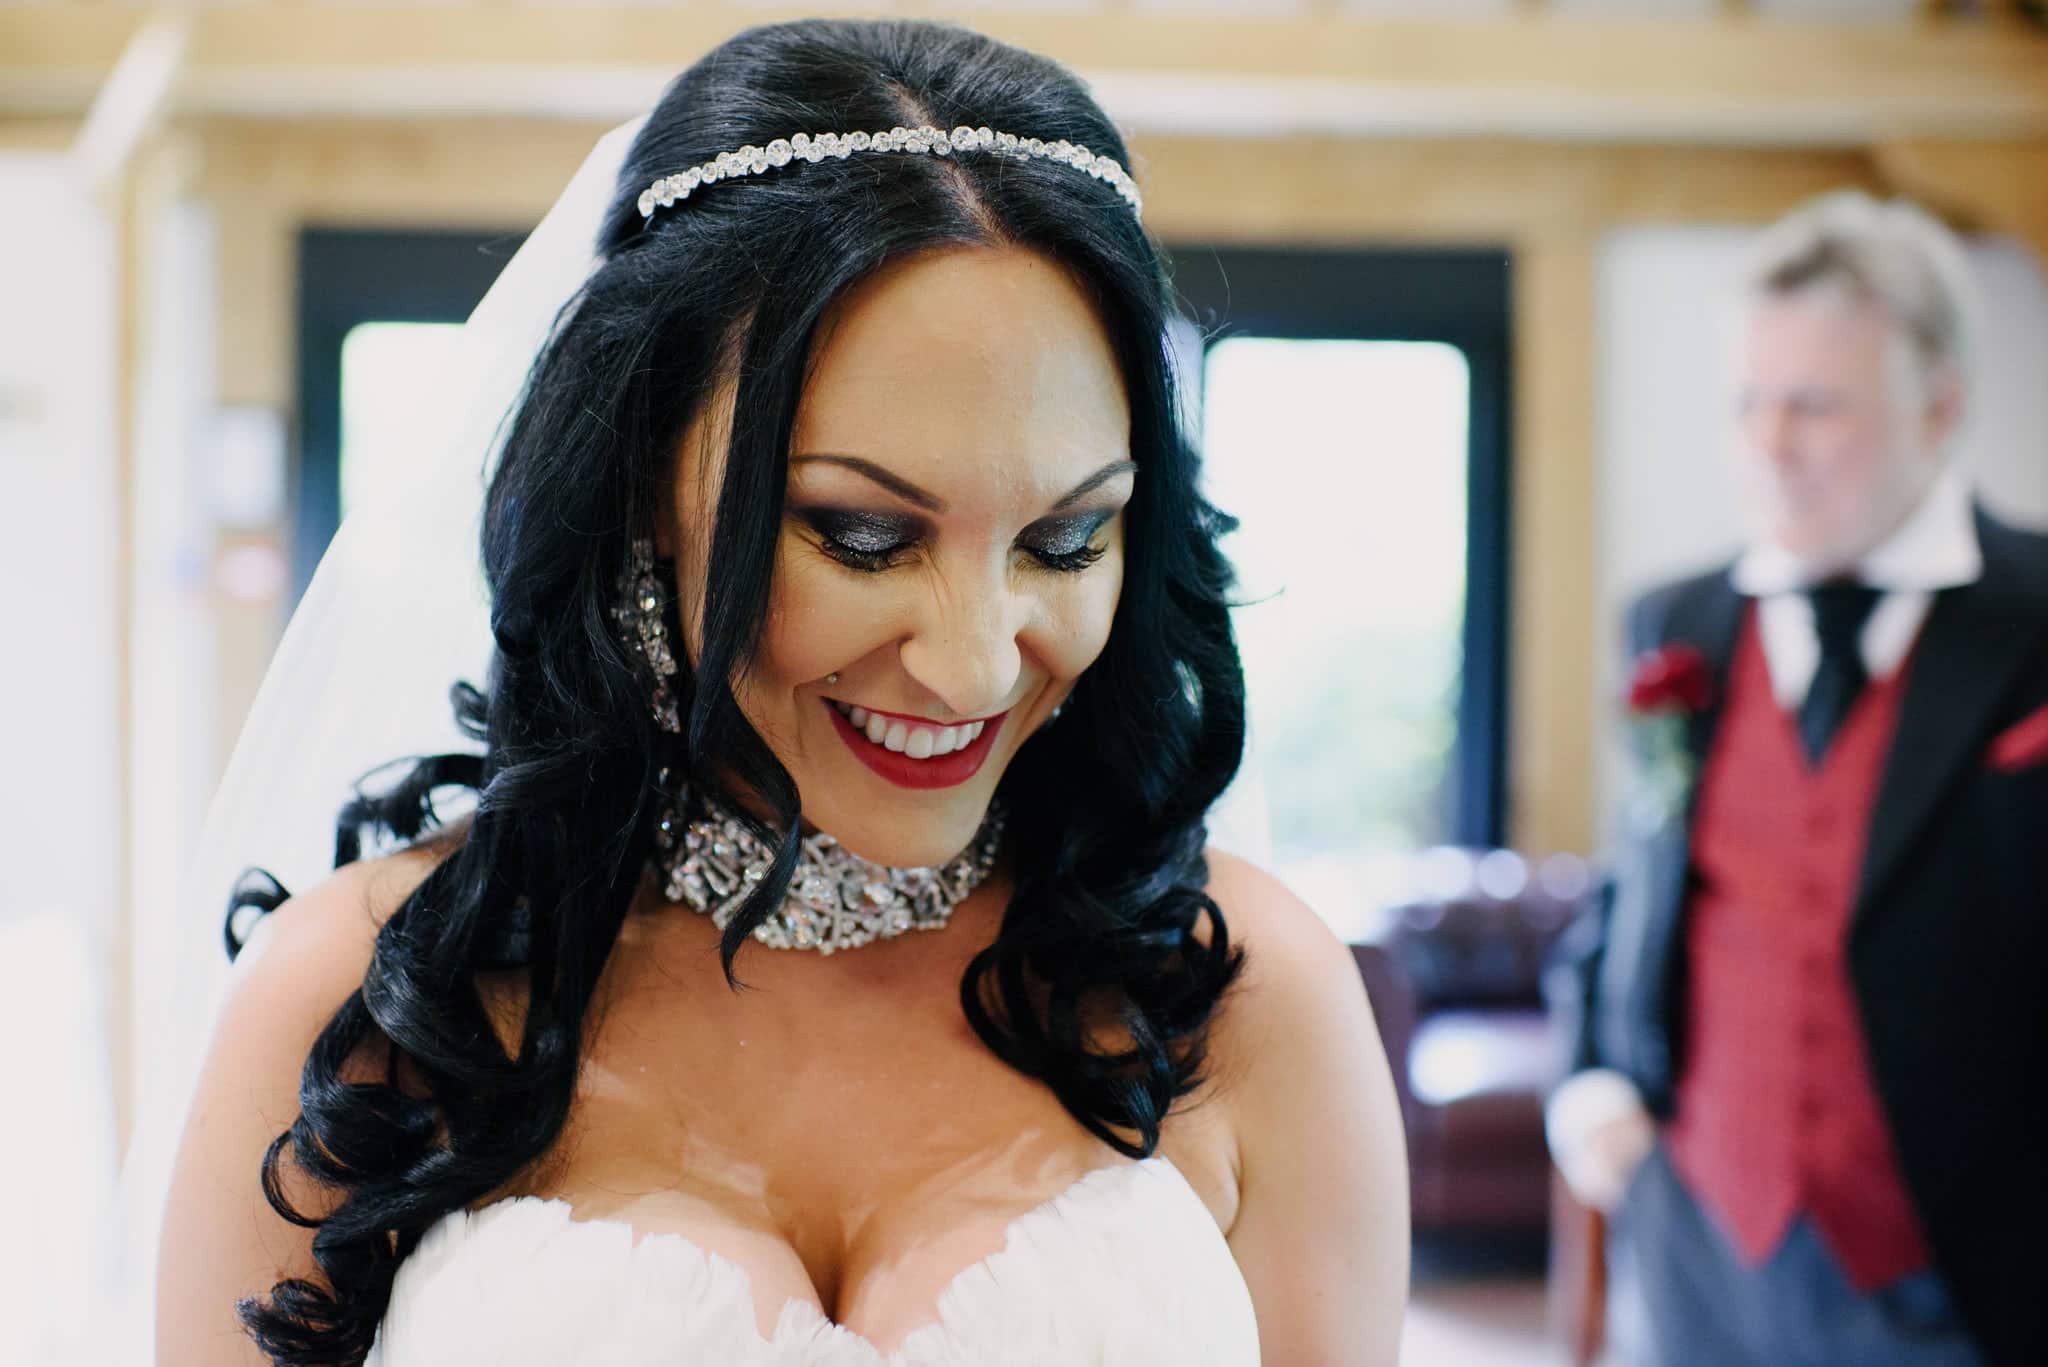 Caroline & Gus - Second Shooting an Essex Wedding 7